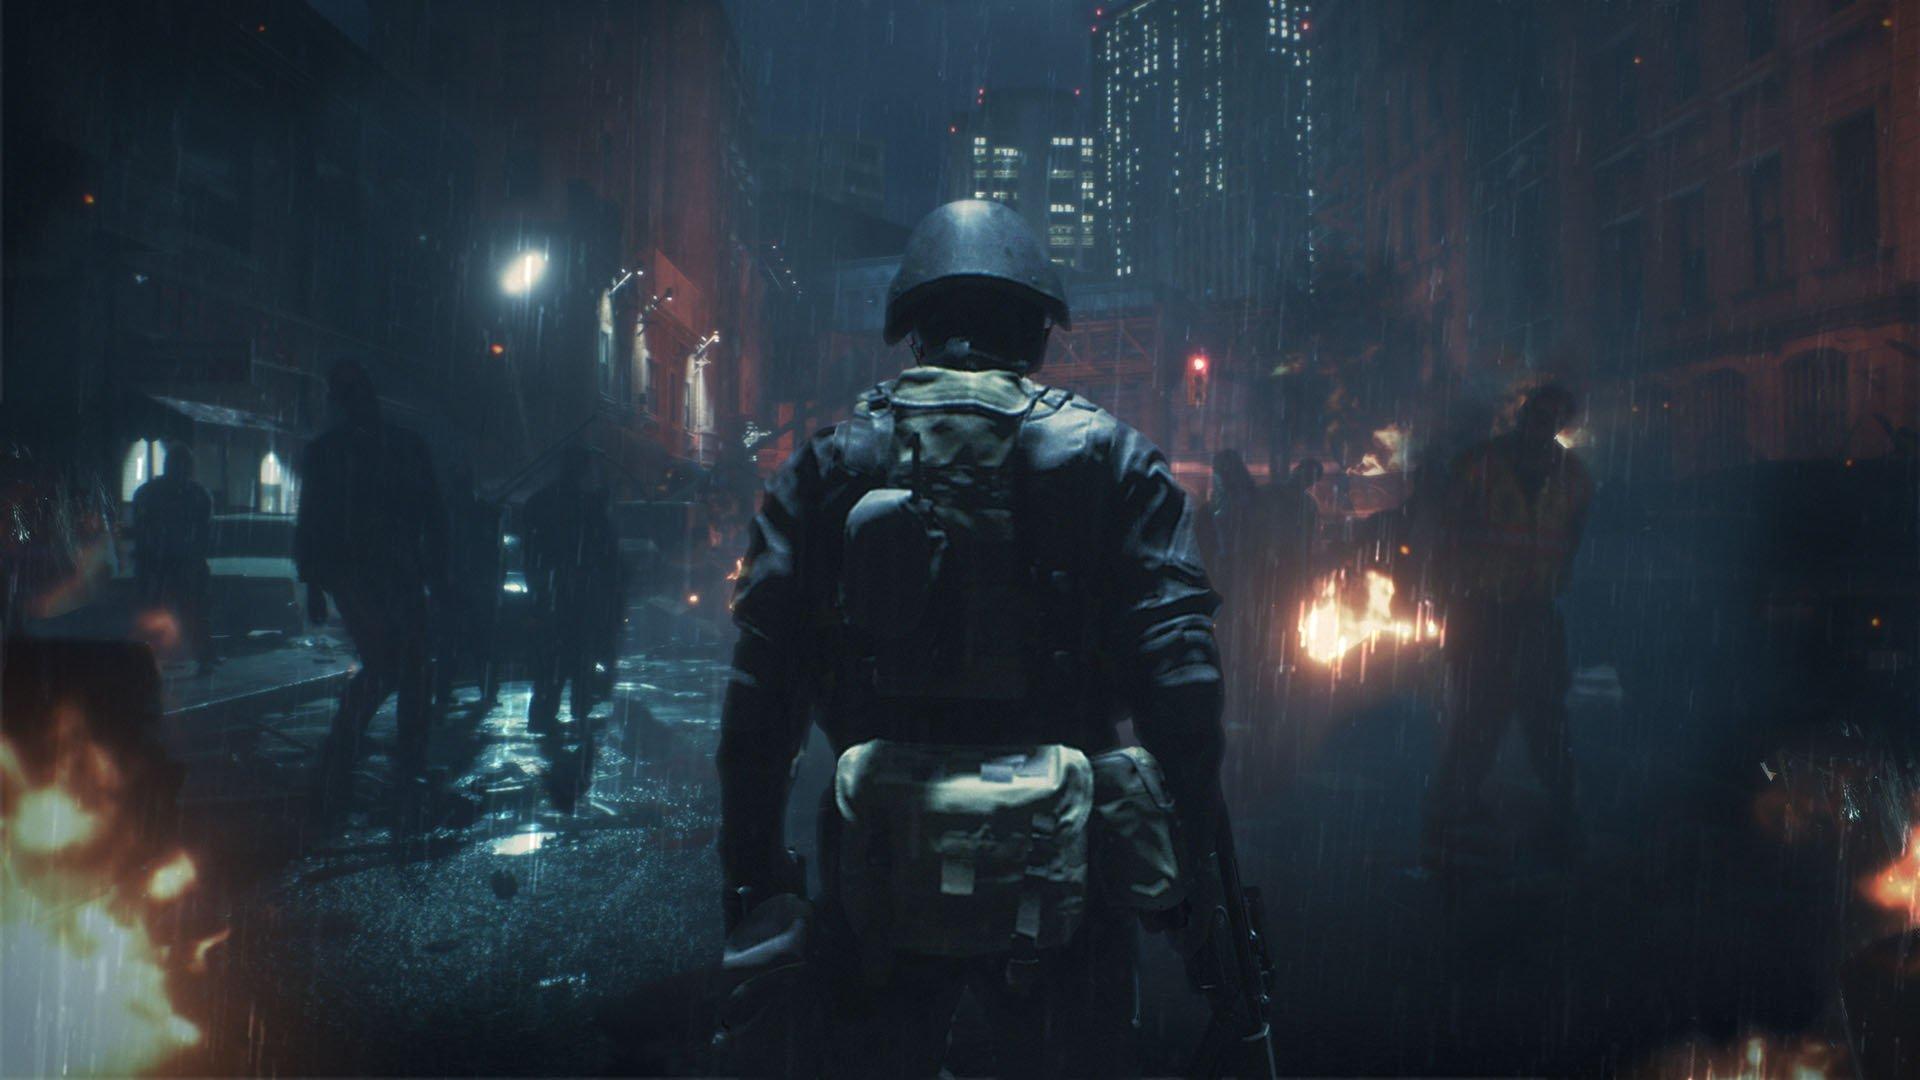 Resident Evil 2 Remake 4th Survivor 1920x1080 Wallpaper Teahub Io